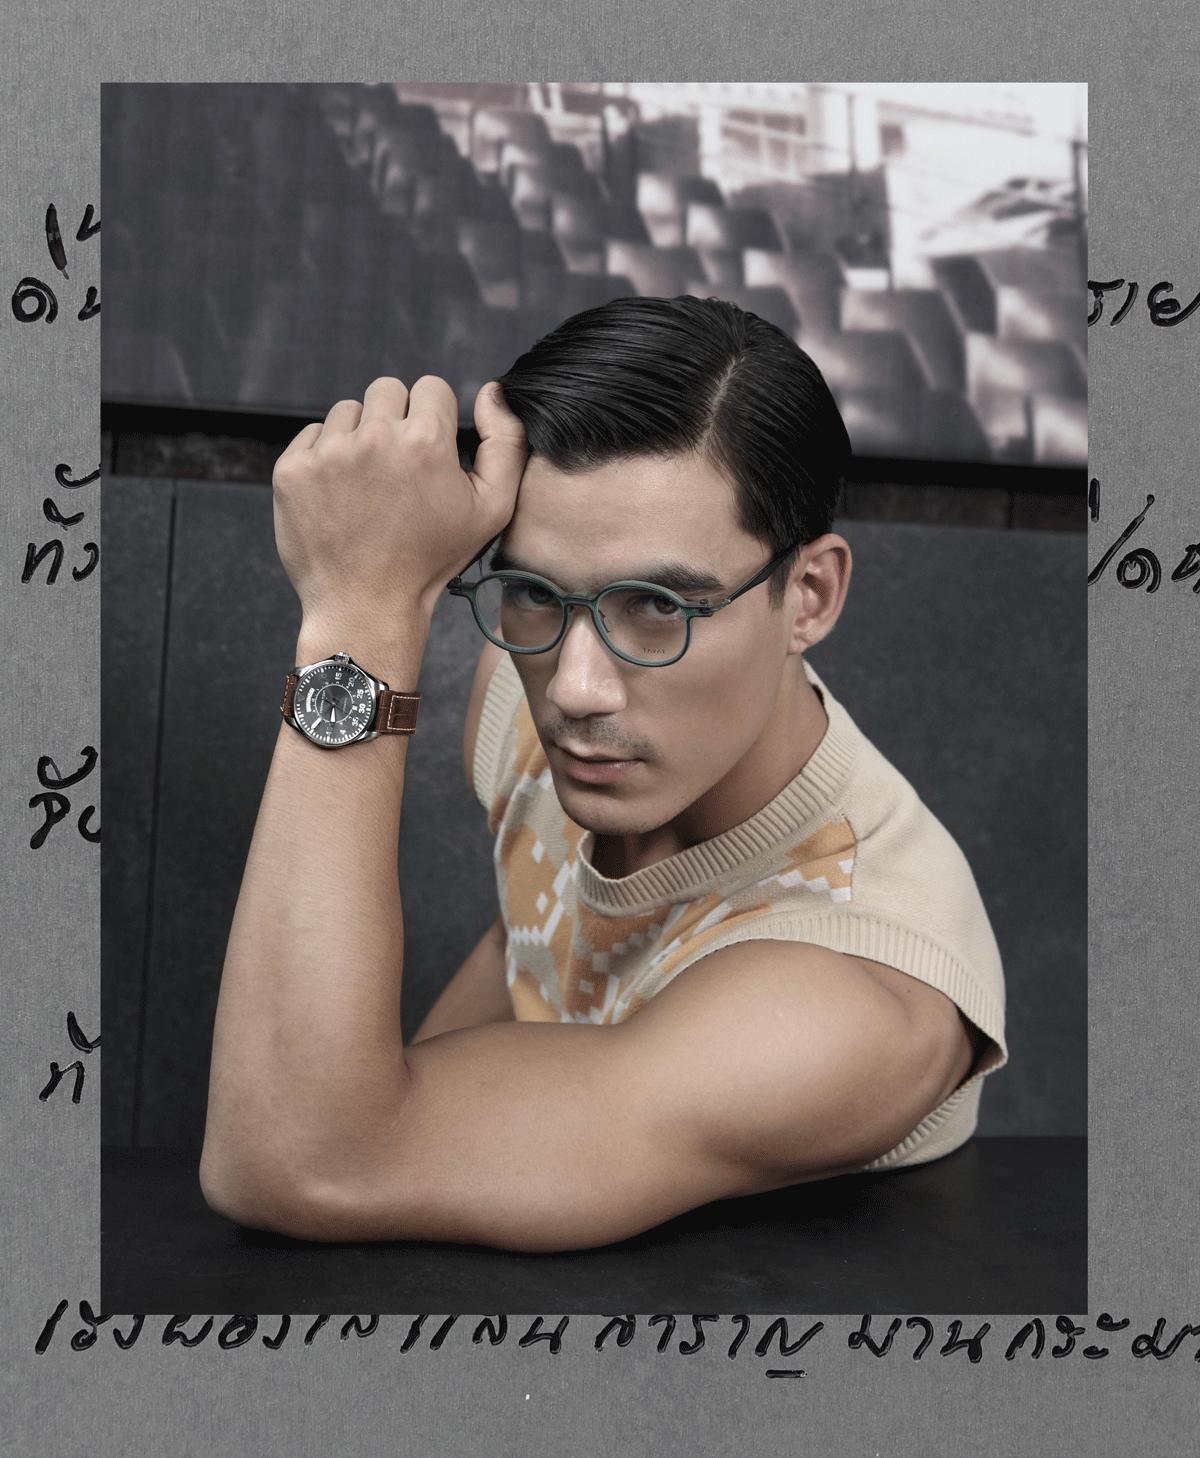 clothes : Everyday Karmakamet / watch : Hamilton Lhaki Pilot Day Date / eyeglasses : TAVAT